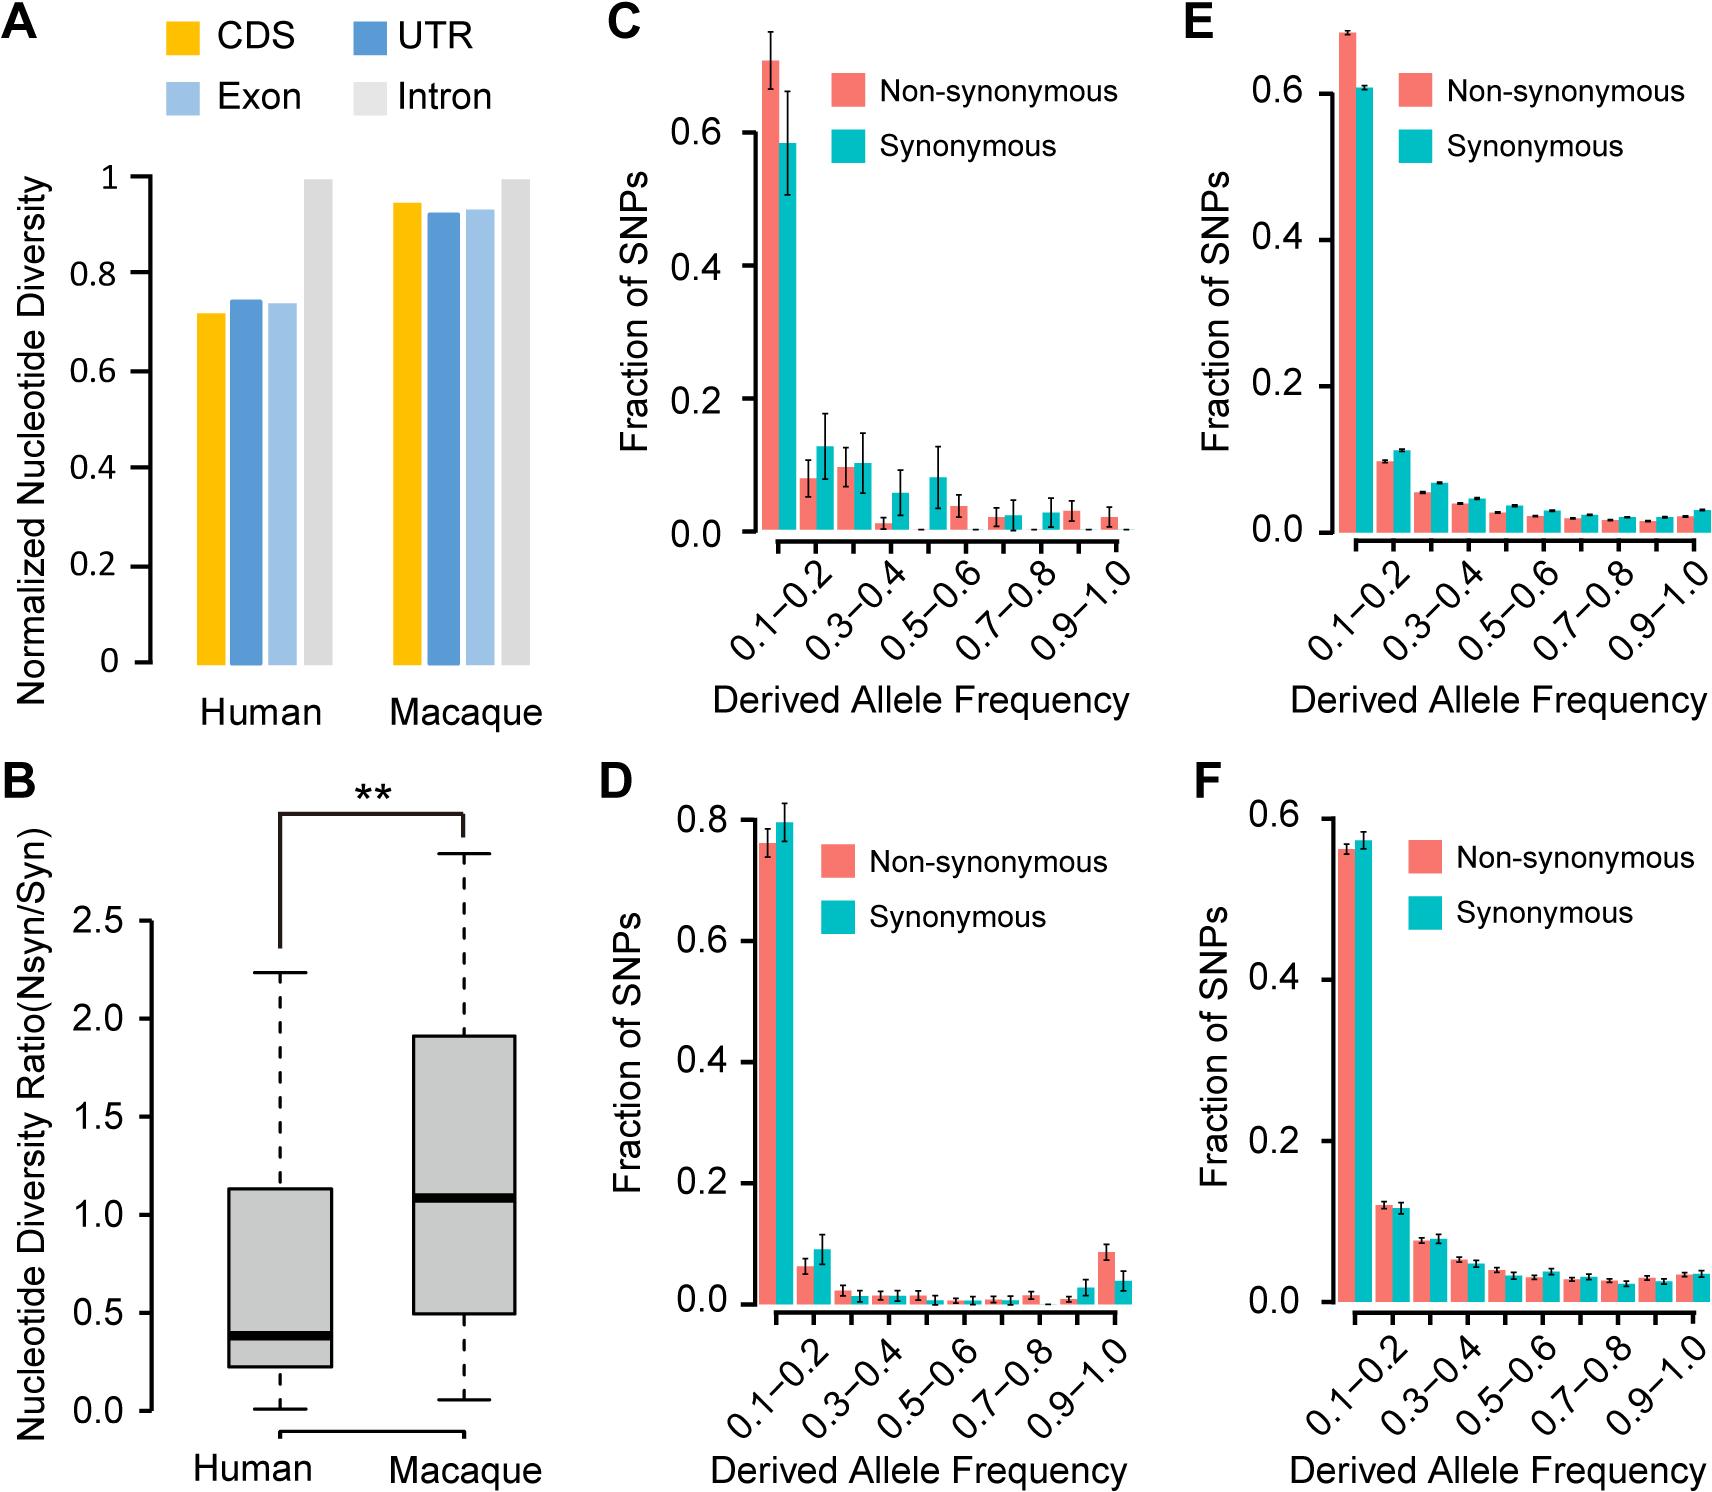 Evidence of purifying selection on the human <i>de novo</i> genes.